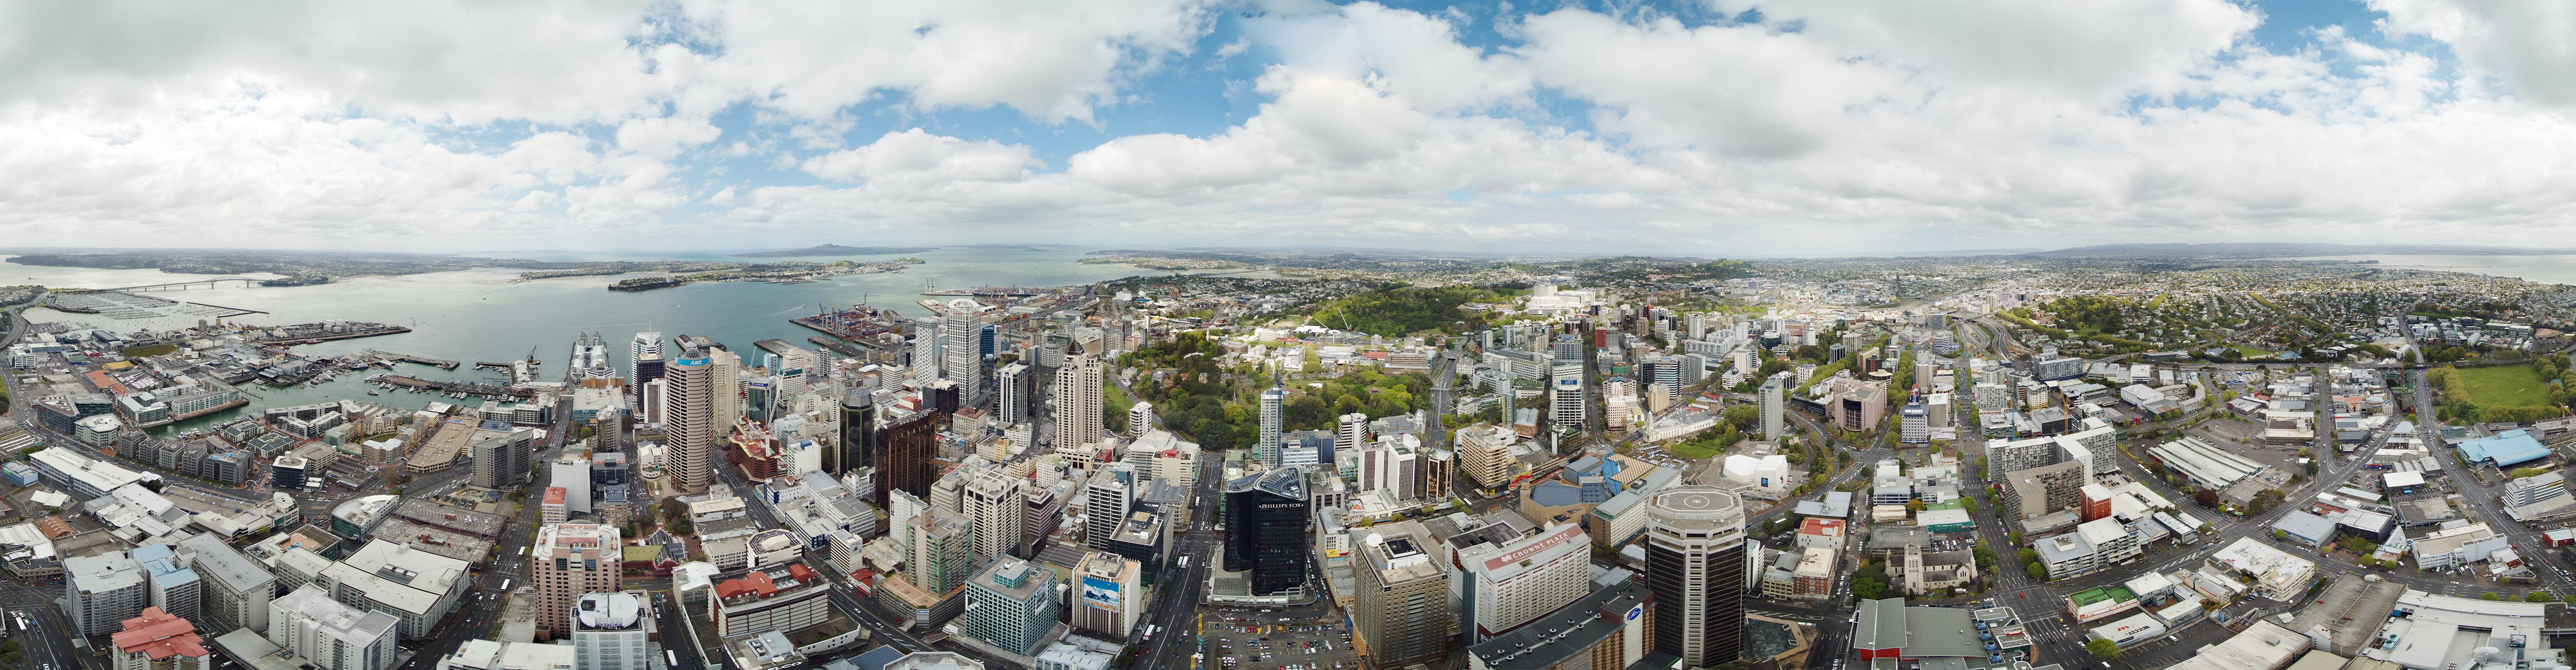 Top Fine-Dining Restaurants in Sydney